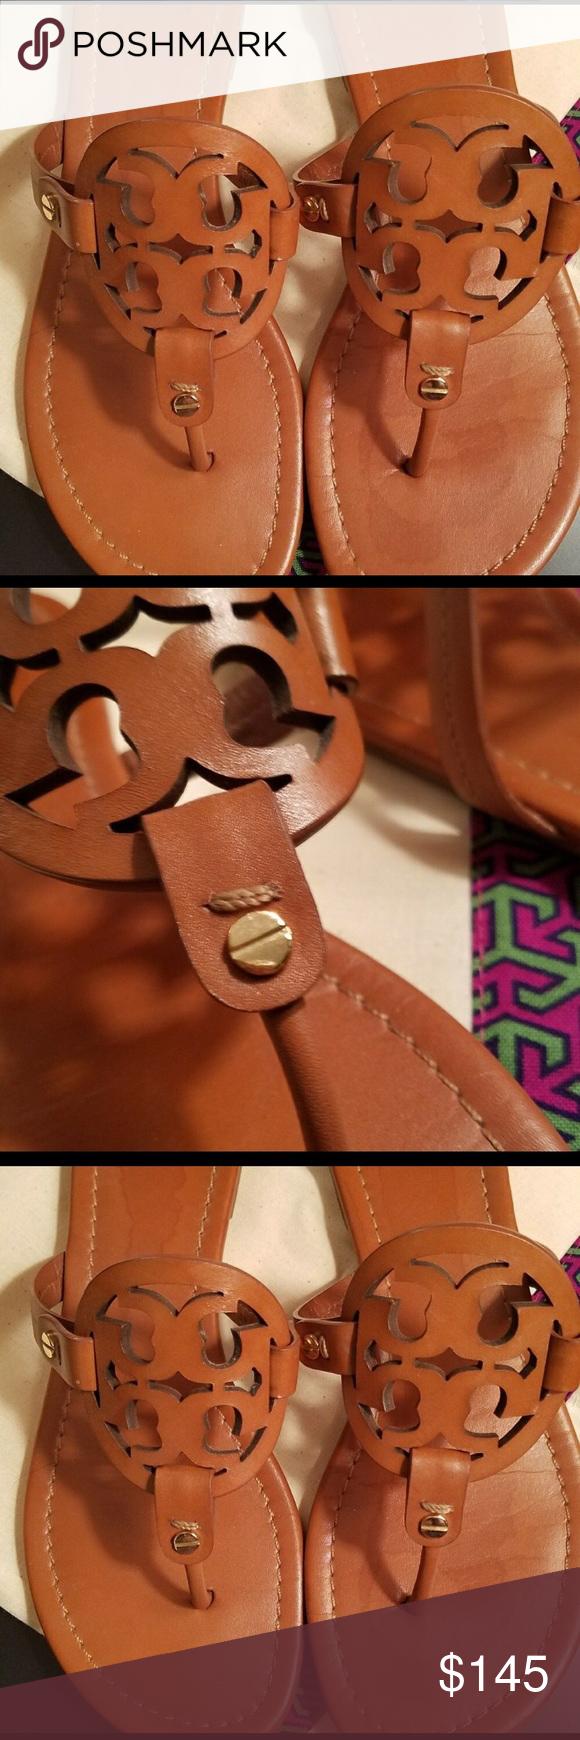 4eedf9394bacc Tory Burch Leather Vachetta Miller Sandals 8.5